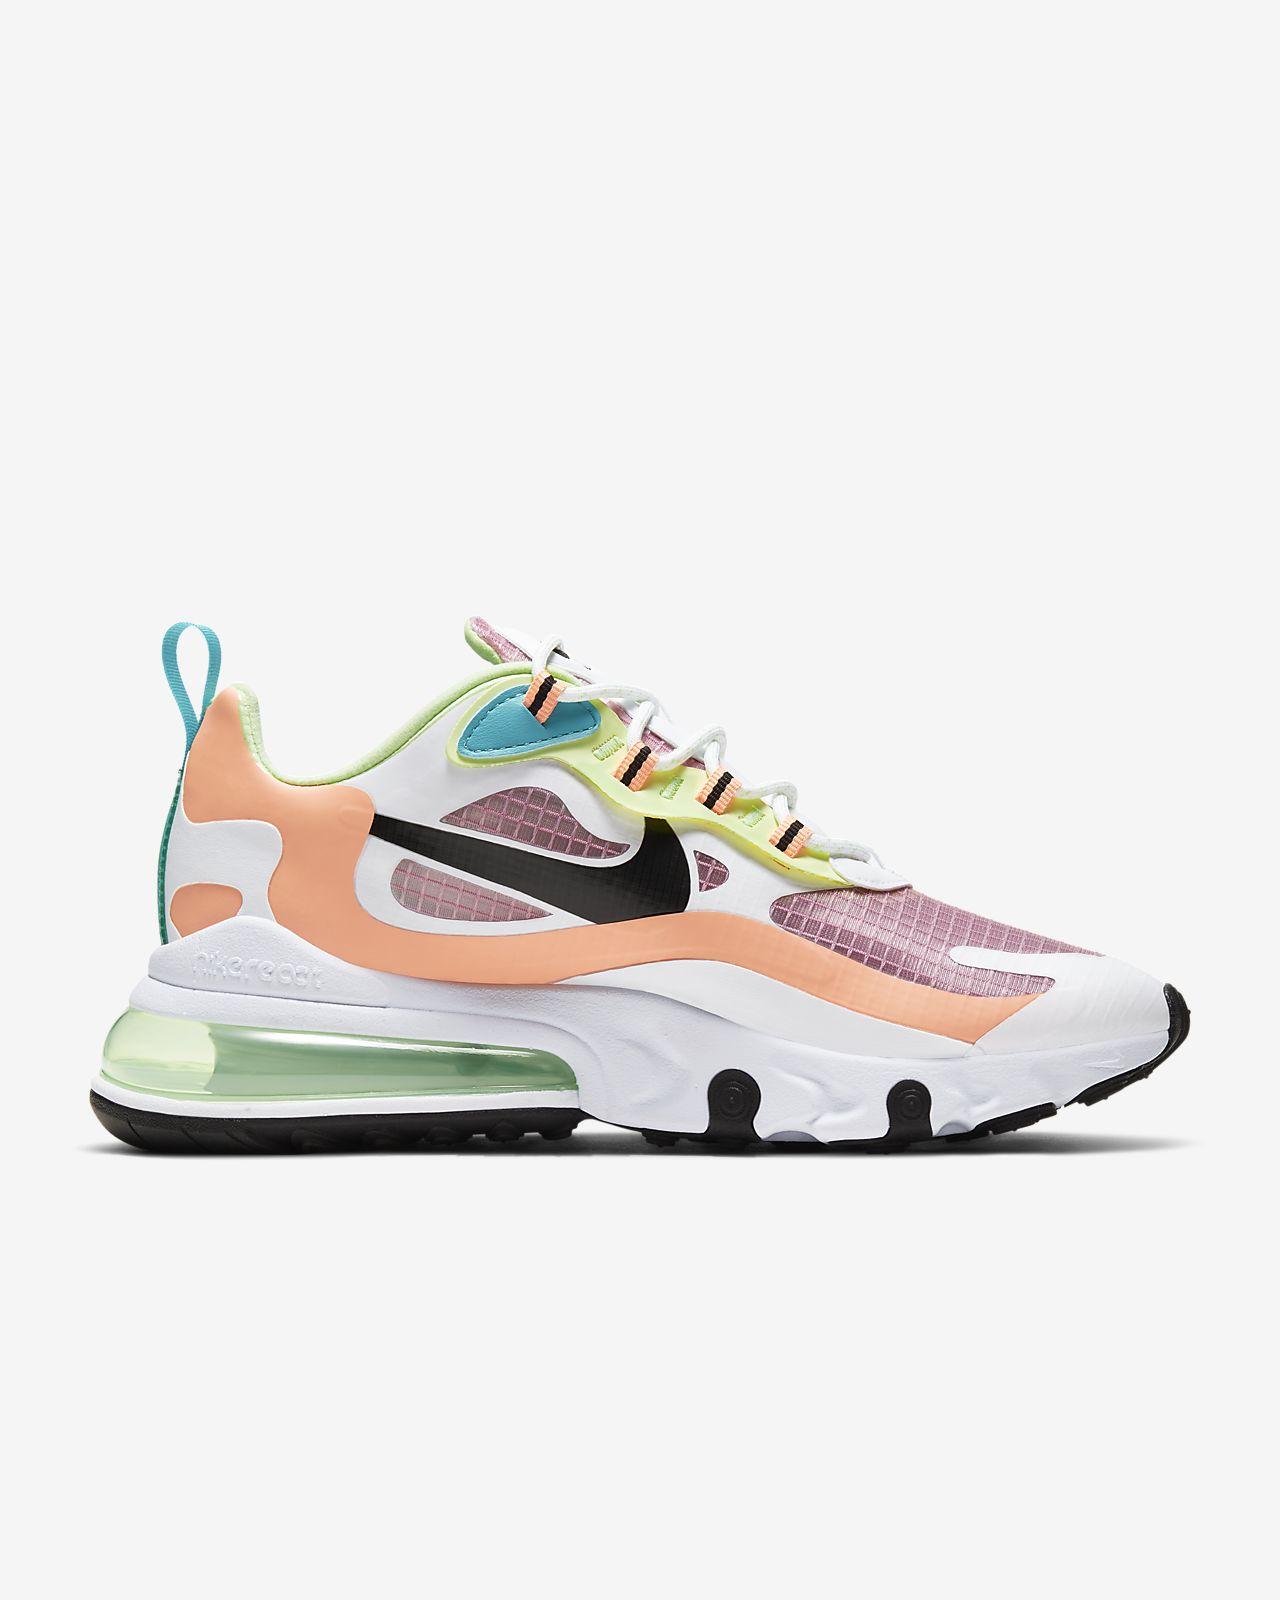 sin impuesto de venta retro online para la venta Nike Air Max 270 React SE Women's Shoe. Nike LU